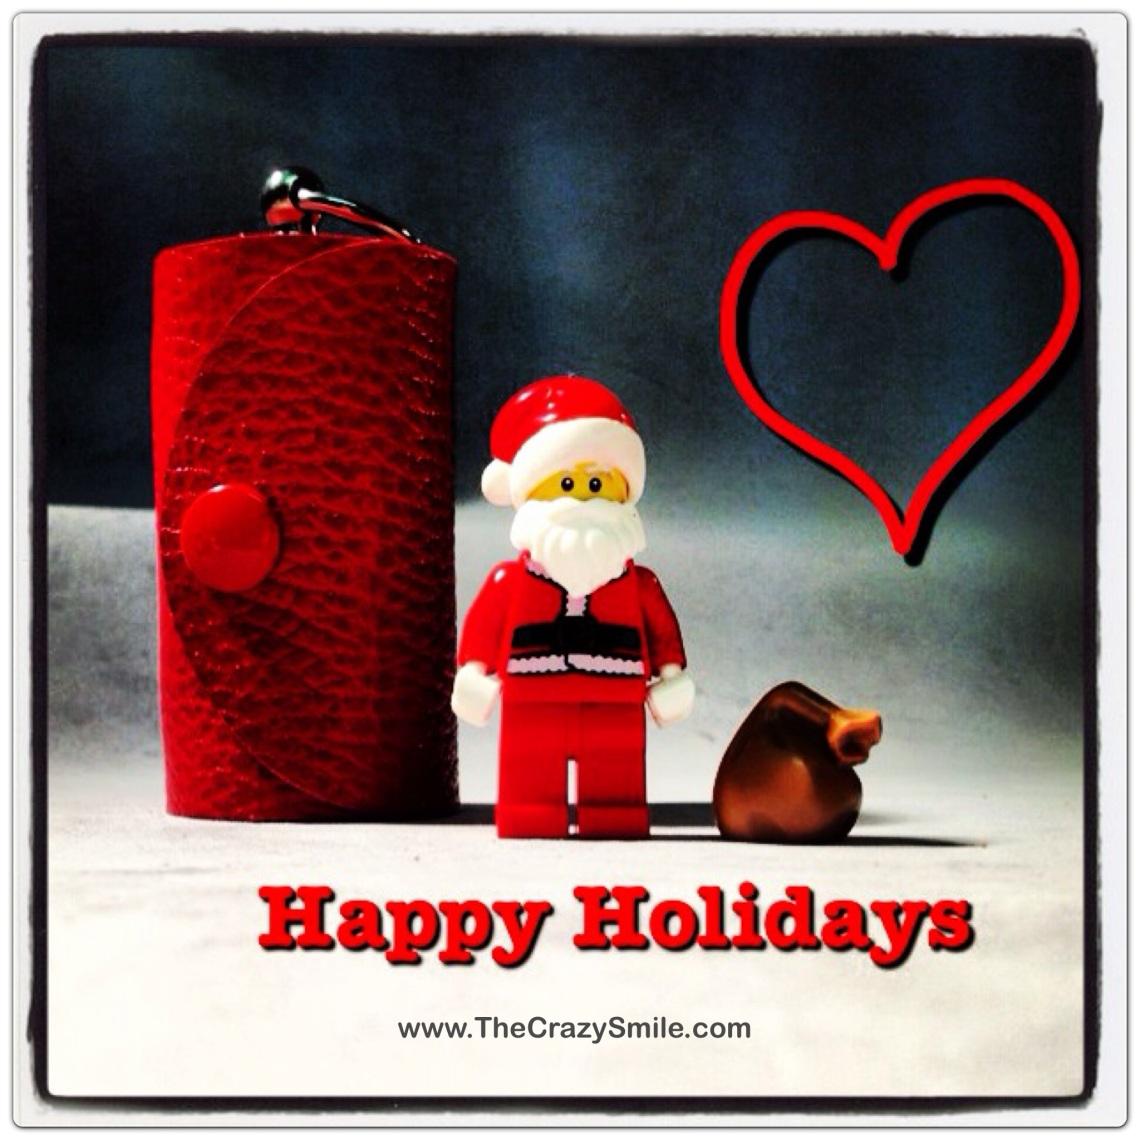 Happy Holidays from TheCrazySmile